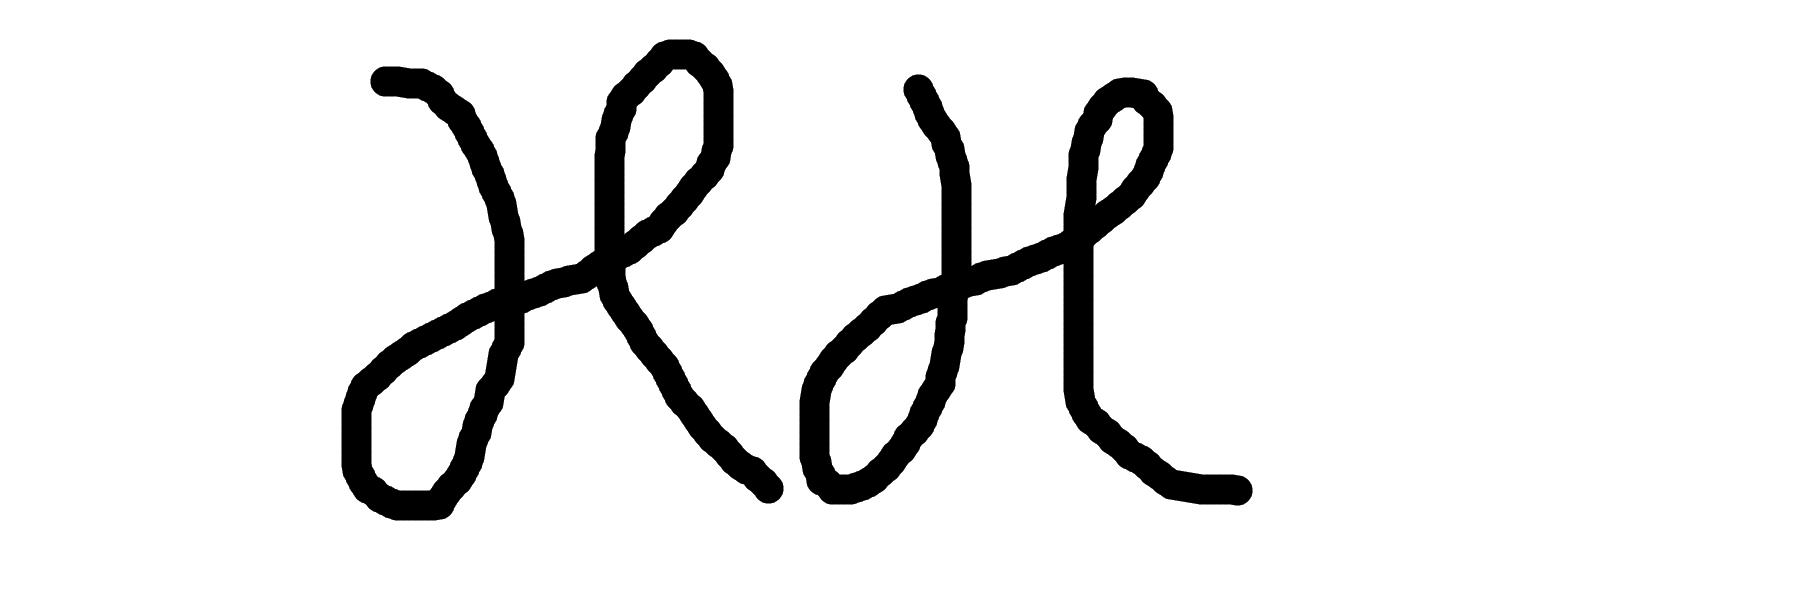 H Hu's Signature